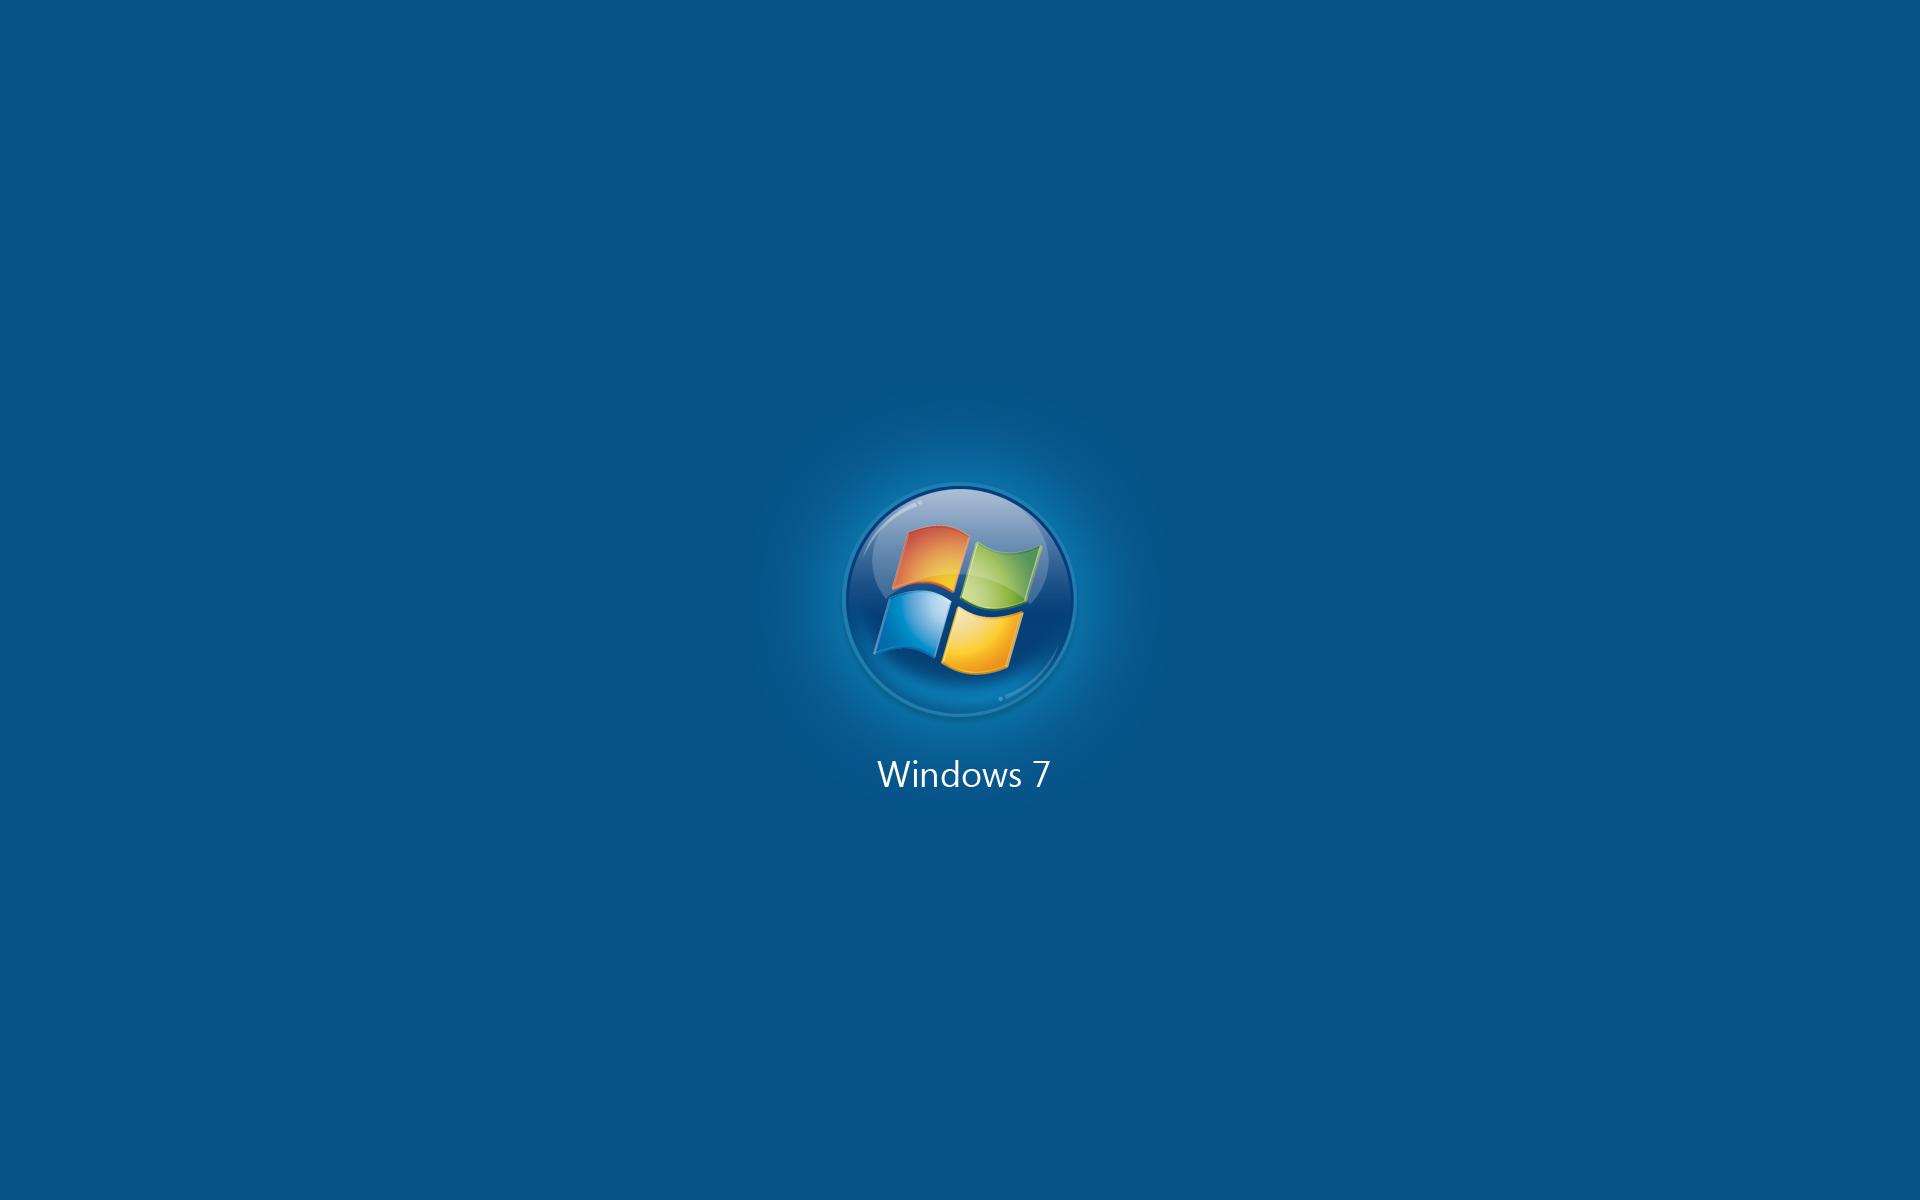 windows 7 wallpaper 39472